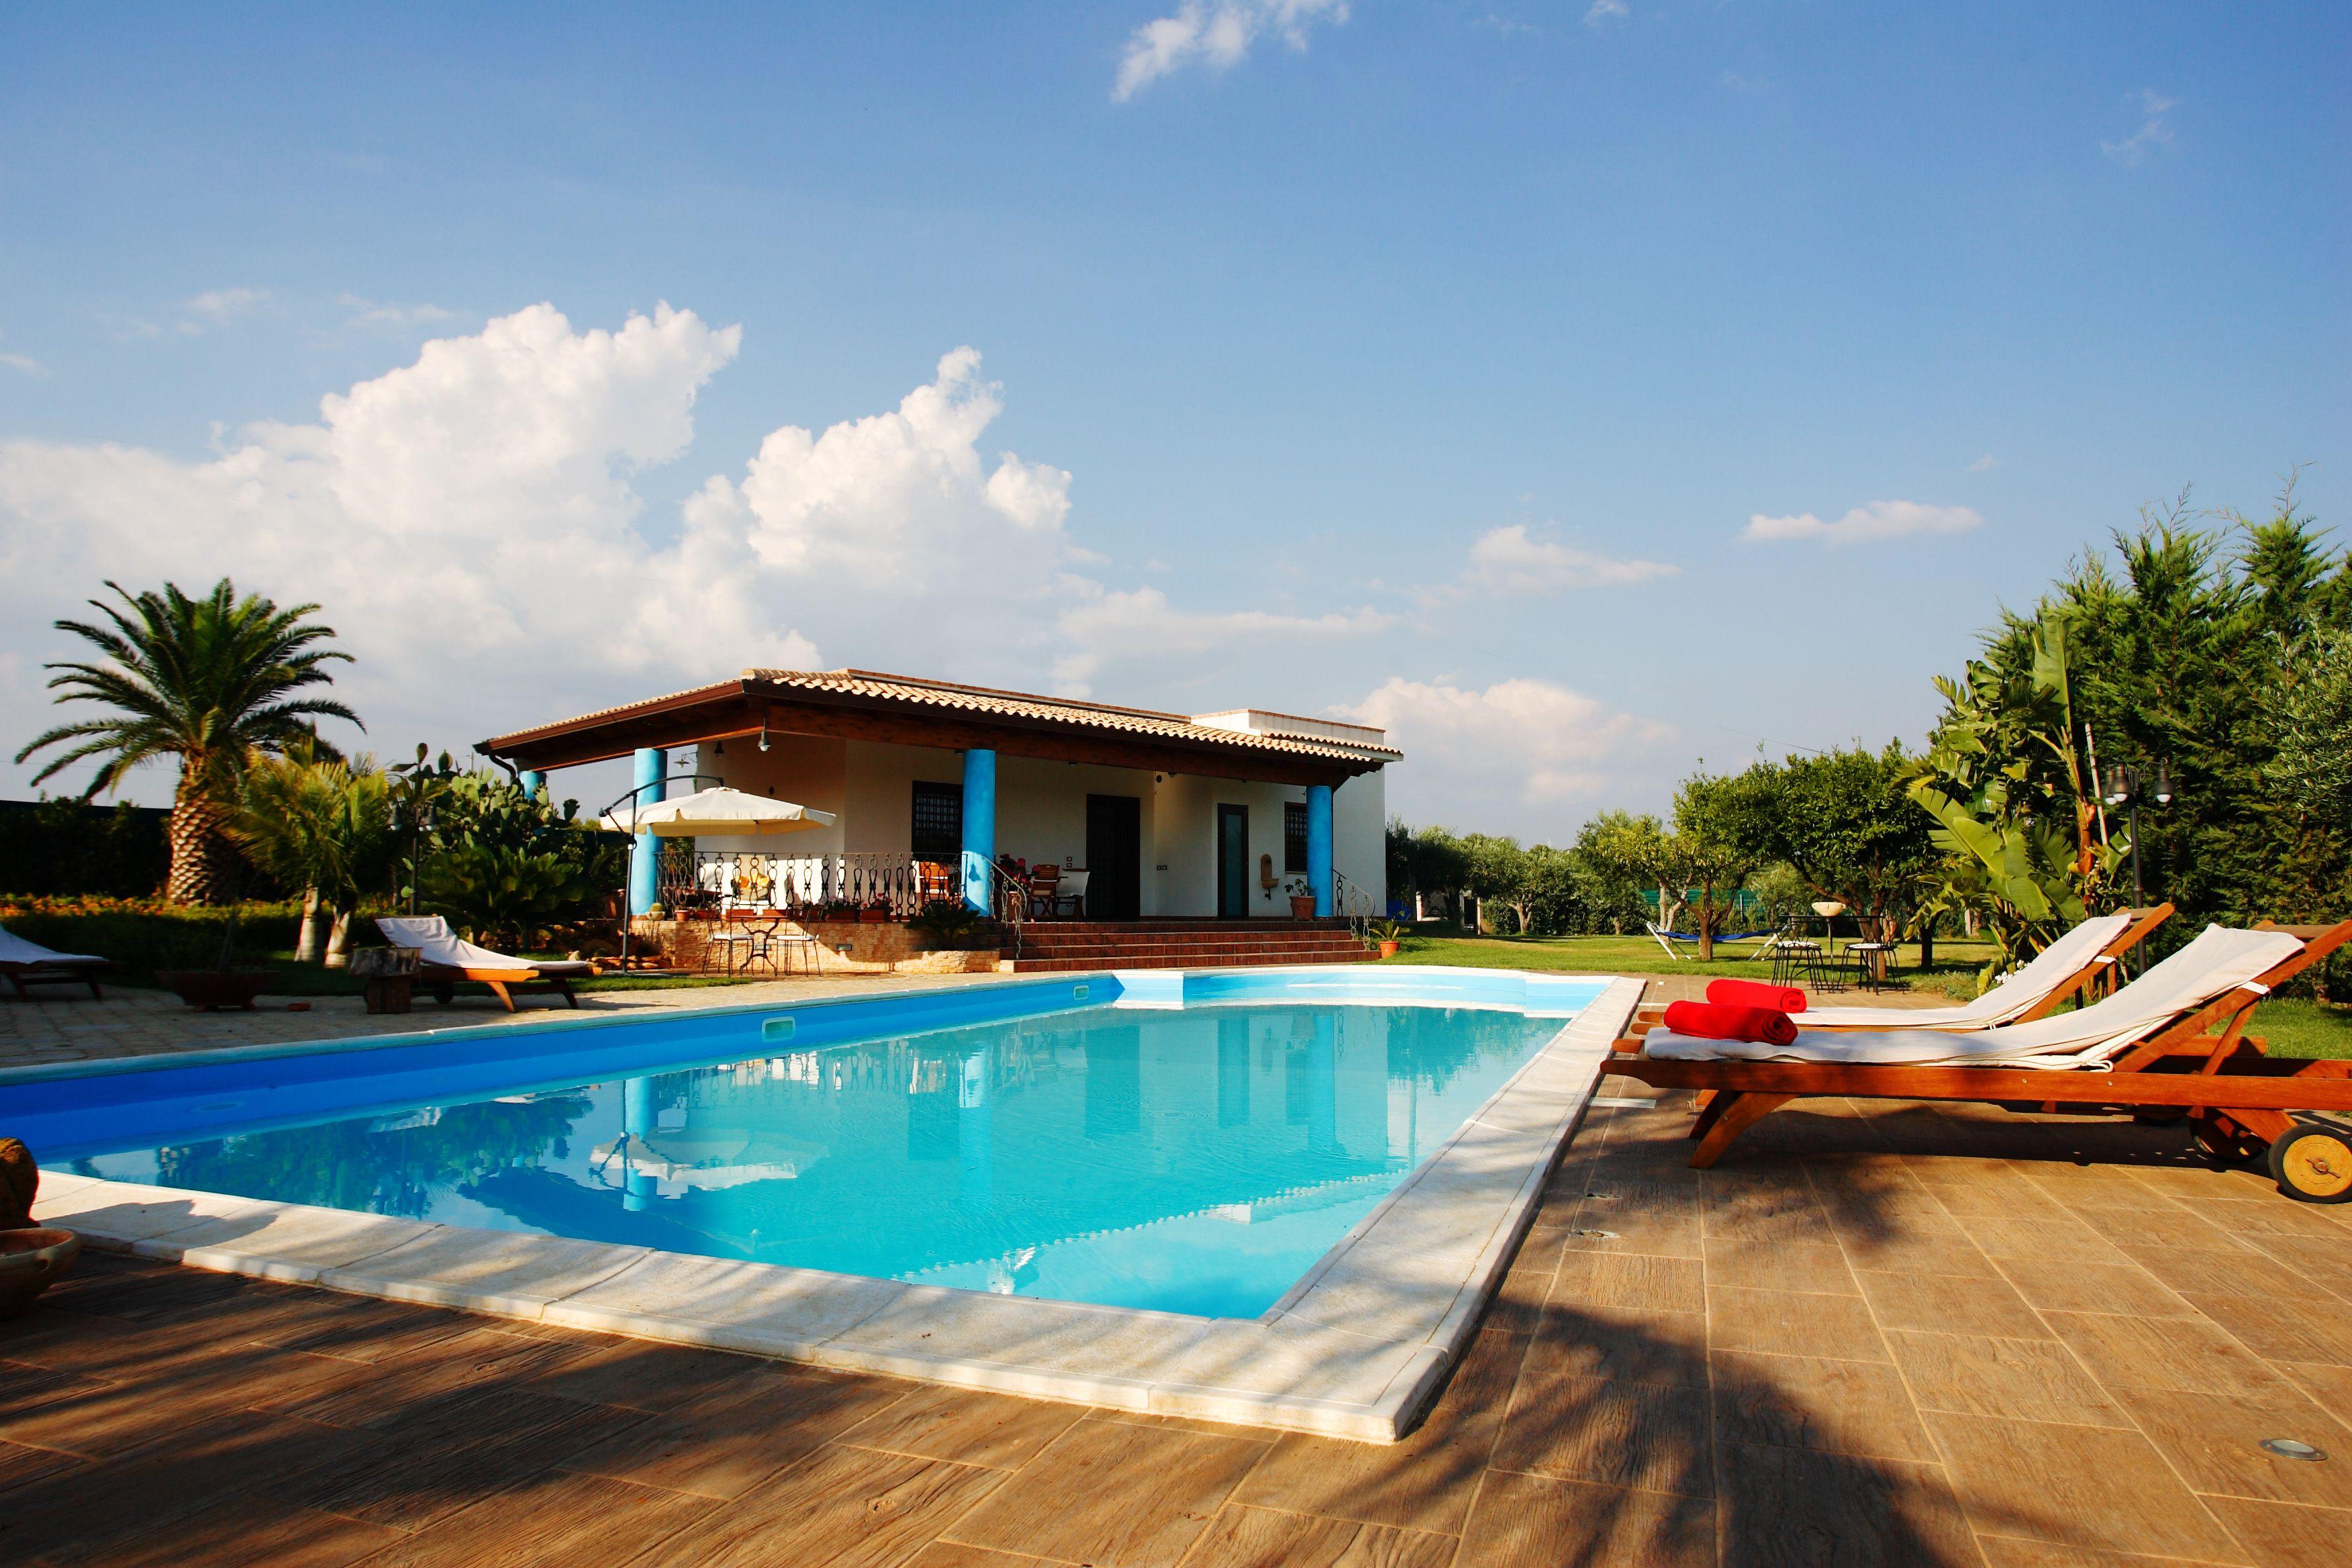 Homeaway Vacation Rentals Beach Houses Condos Cabins Villas Vacation Rental Homes Pool House Designs Beautiful Pools Swimming Pools